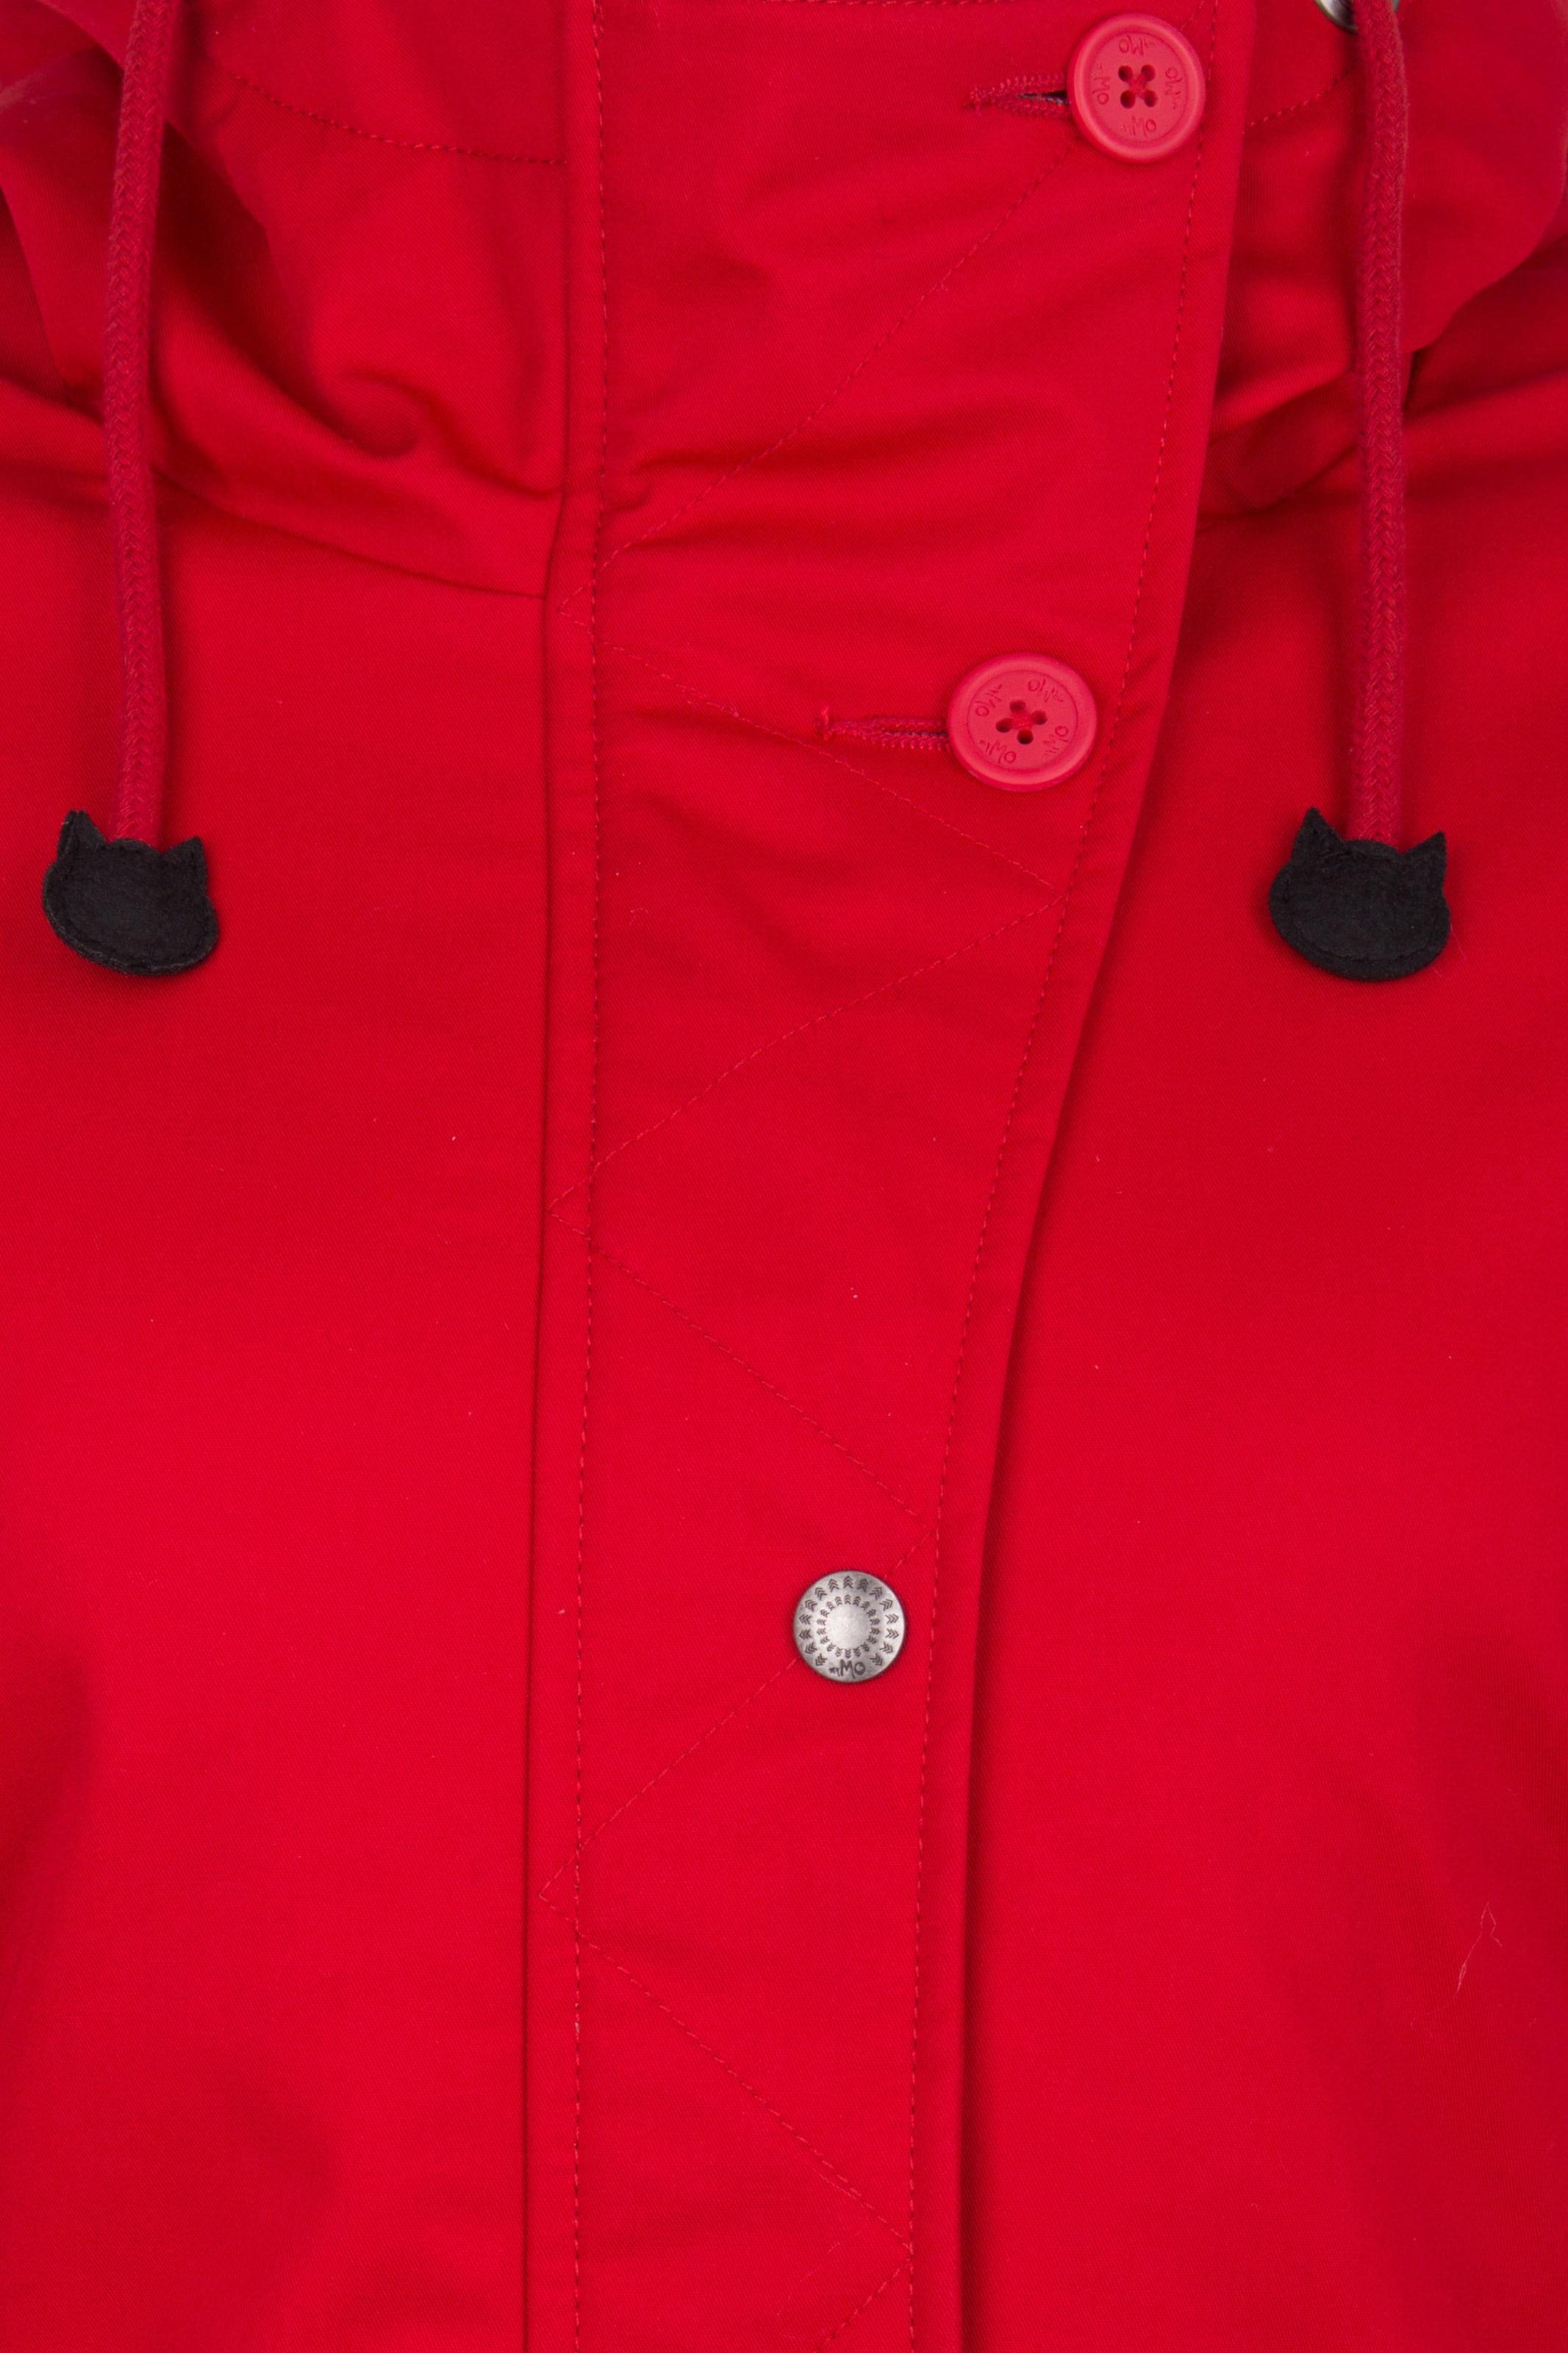 Rouge In In D'hiver MymoParka MymoParka D'hiver Rouge qMUVzpSG